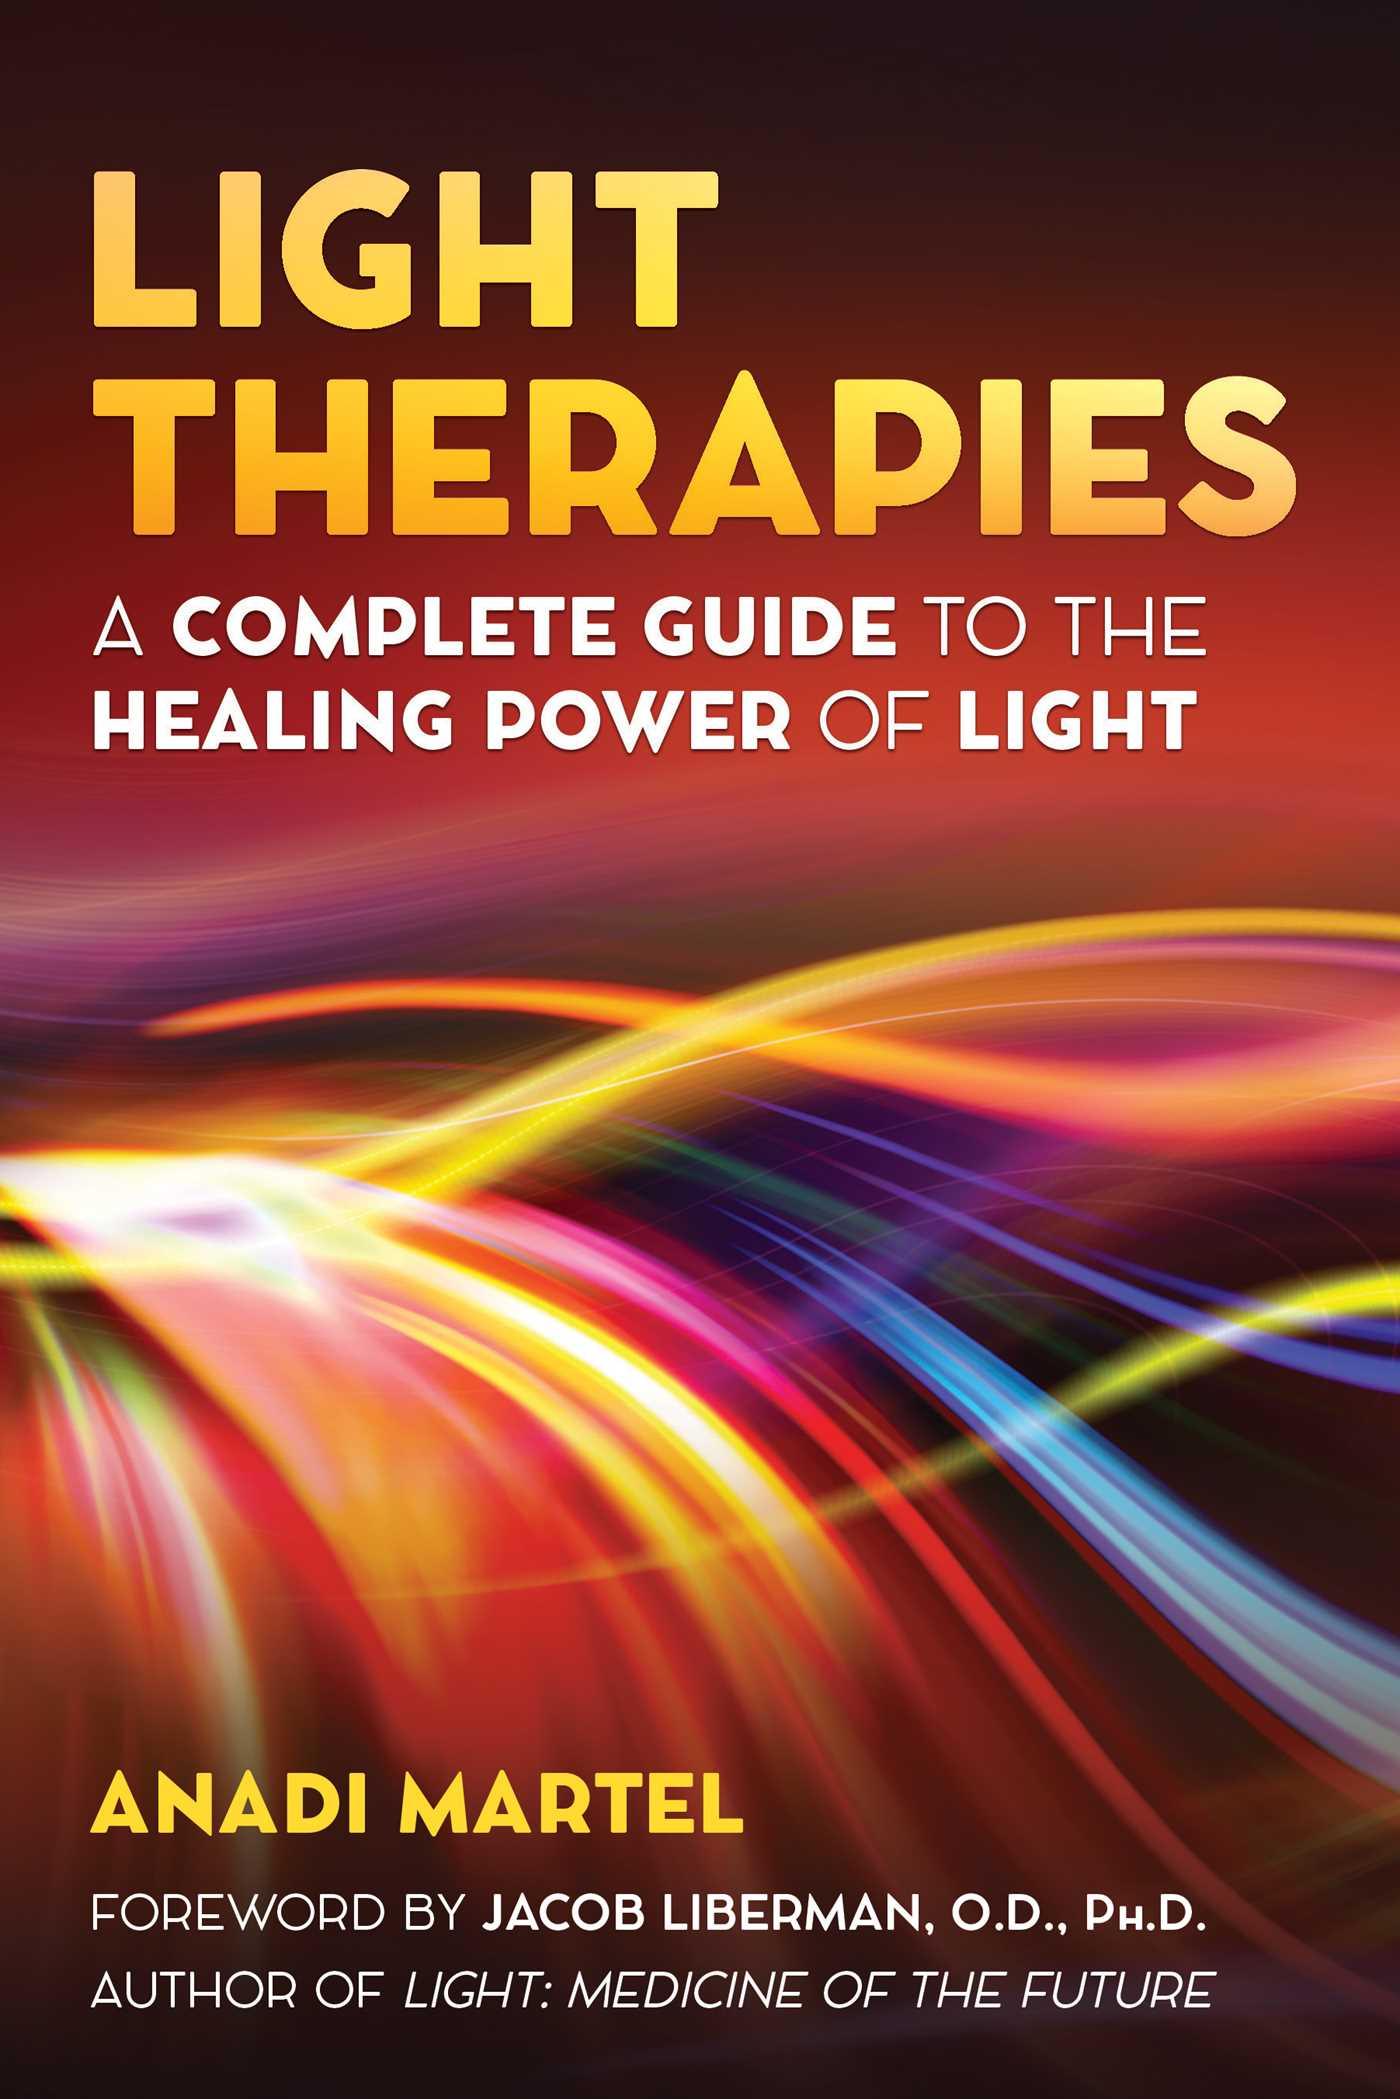 Light therapies 9781620557297 hr